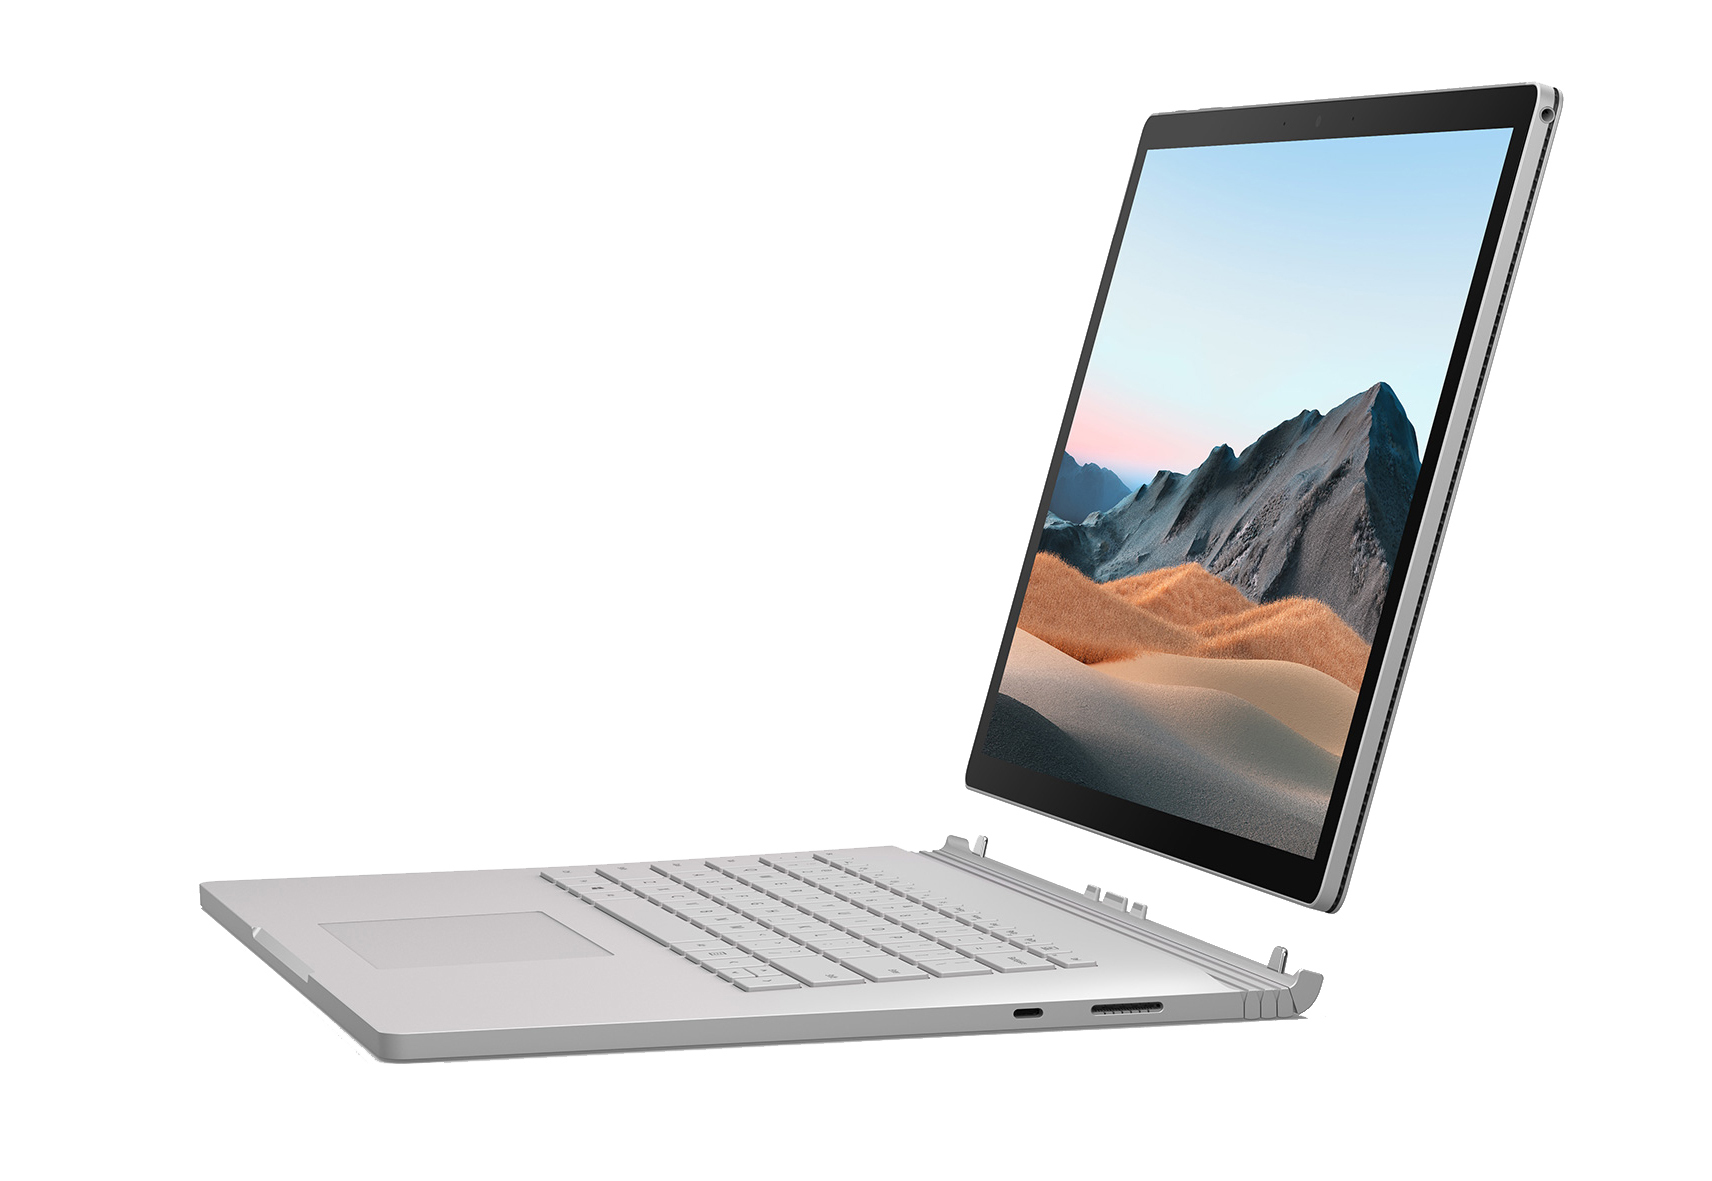 "Microsoft Surface Book 3 Híbrido (2-en-1) Platino 38,1 cm (15"") 3240 x 2160 Pixeles Pantalla táctil Intel® Core™ i7 de 10ma Generación 32 GB LPDDR4x-SDRAM 1000 GB SSD NVIDIA GeForce GTX 1660 Ti Max-Q Wi-Fi 6 (802.11ax) Windows 10 Pro"